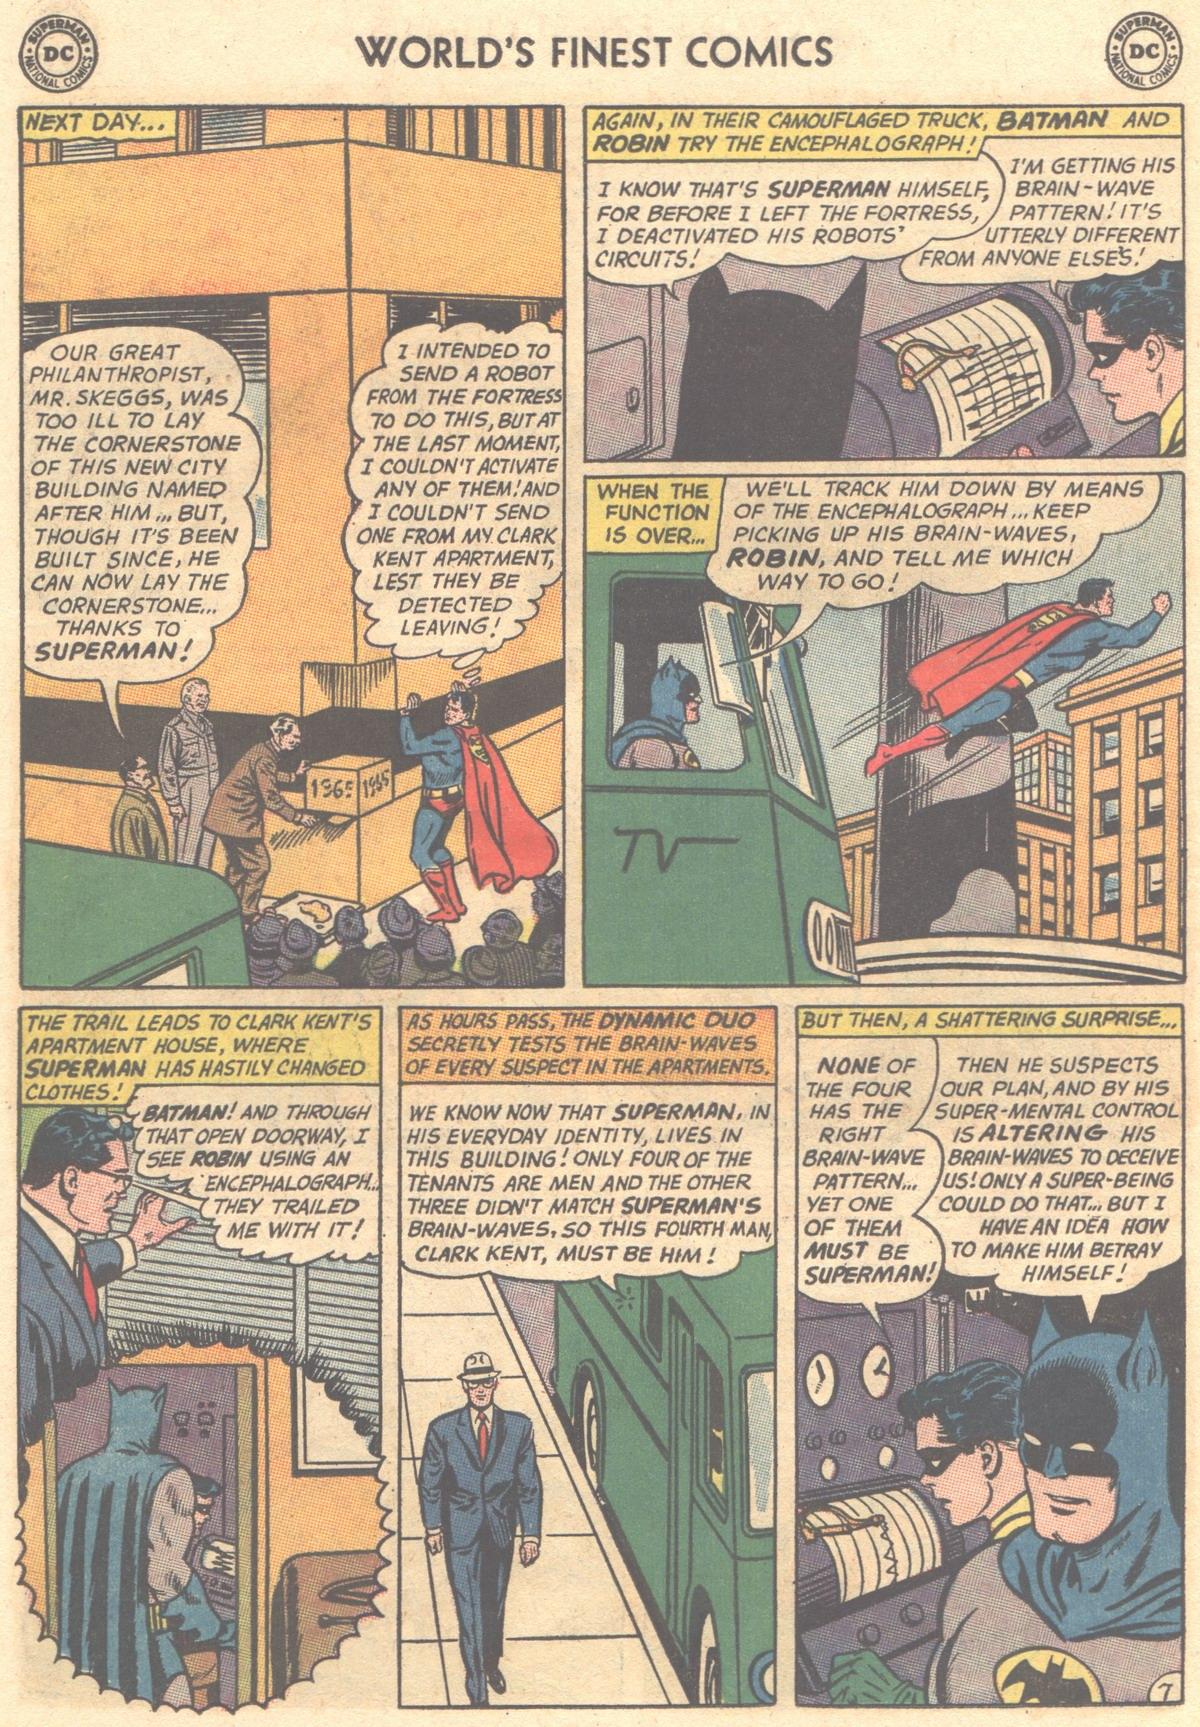 Read online World's Finest Comics comic -  Issue #149 - 10